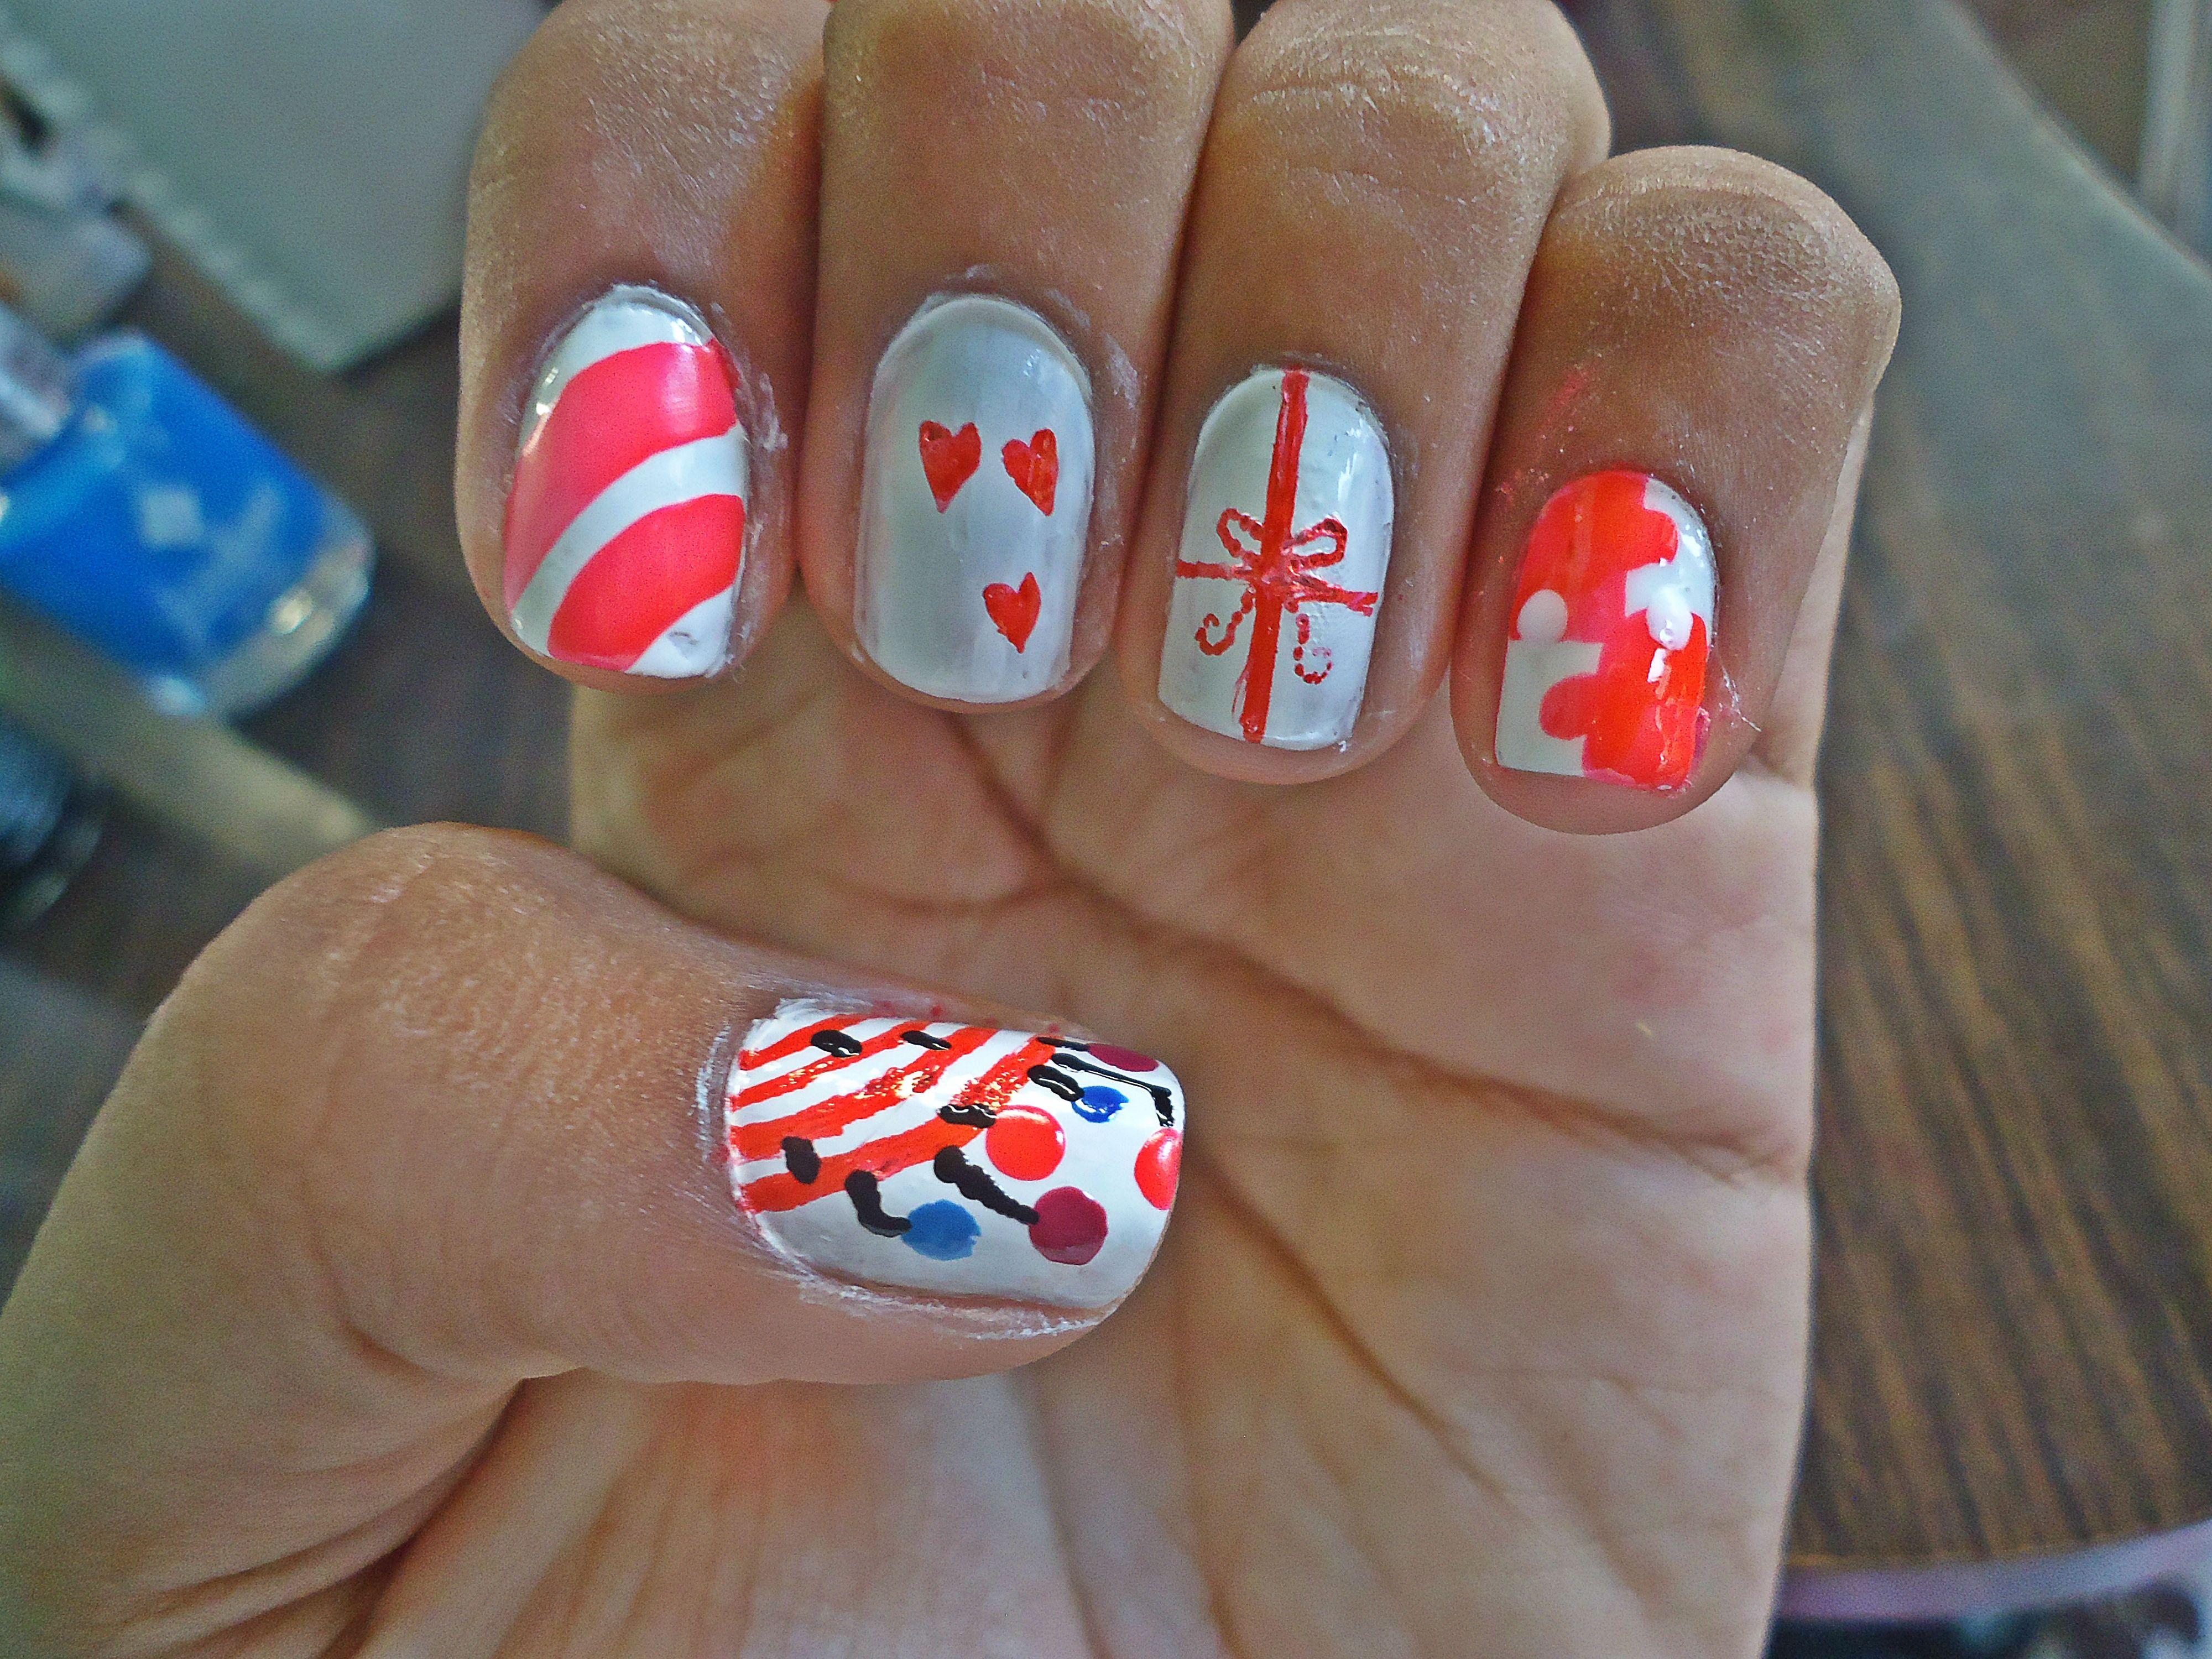 4 ideas faciles de como decorar tus uñas, mas detalles en stylesbeautifulsoul.wordpress.com